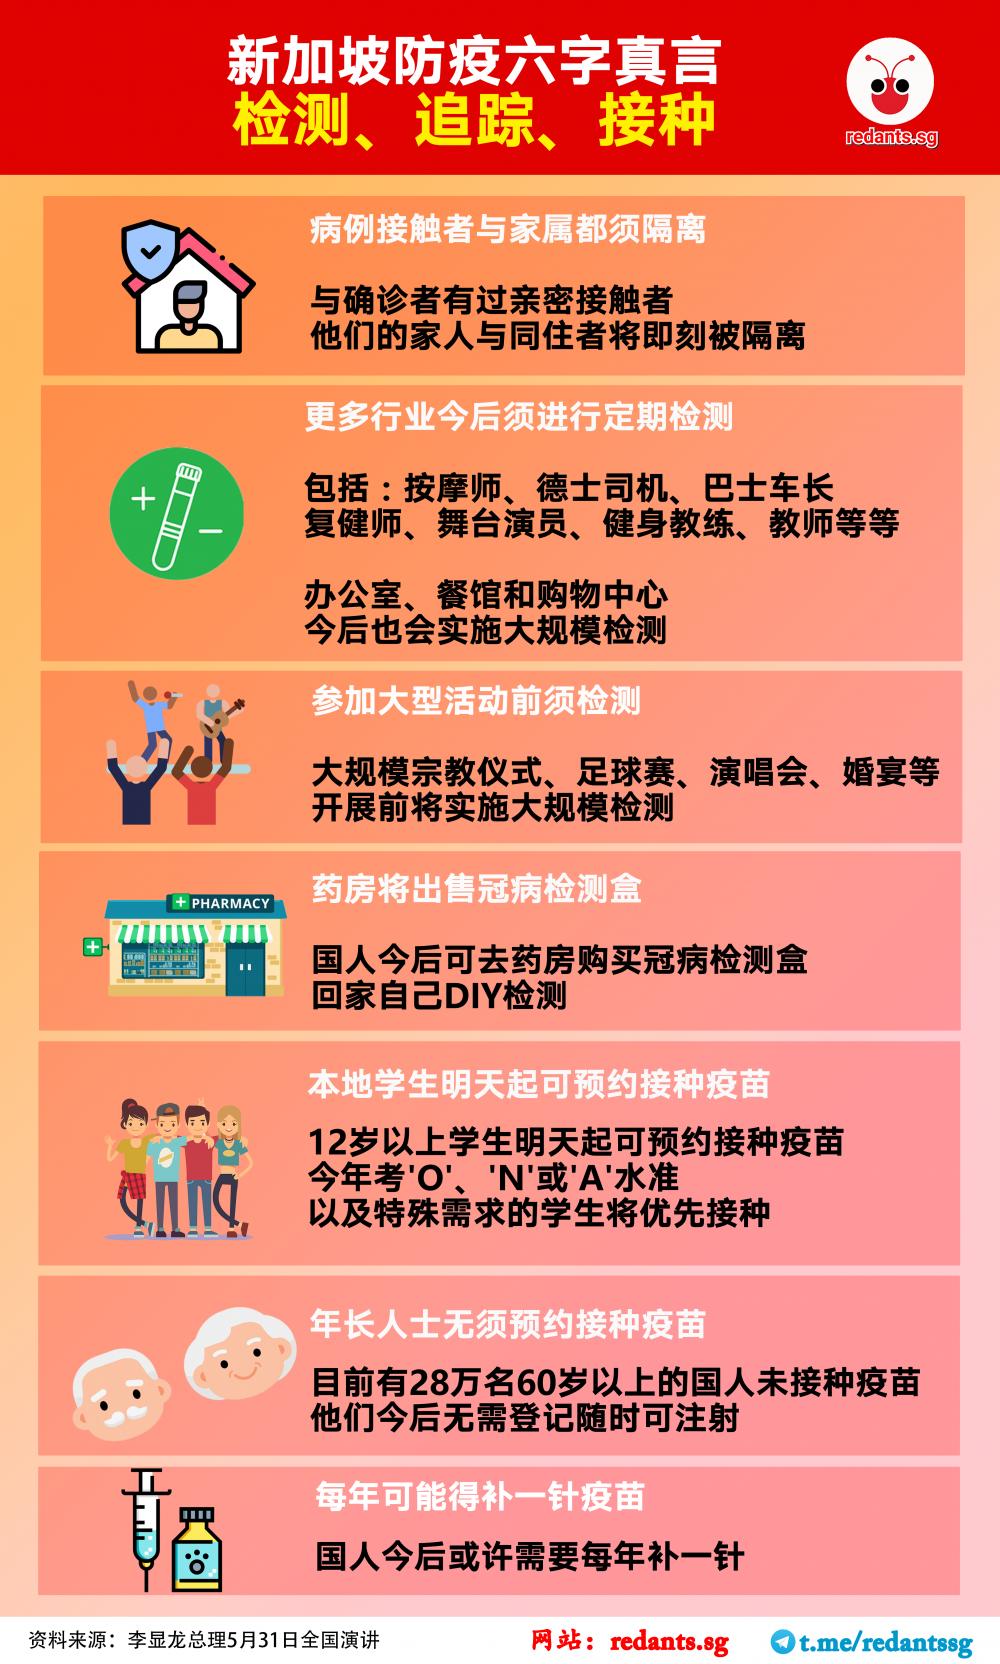 20210531-PM Lee liuzizhenyan.png